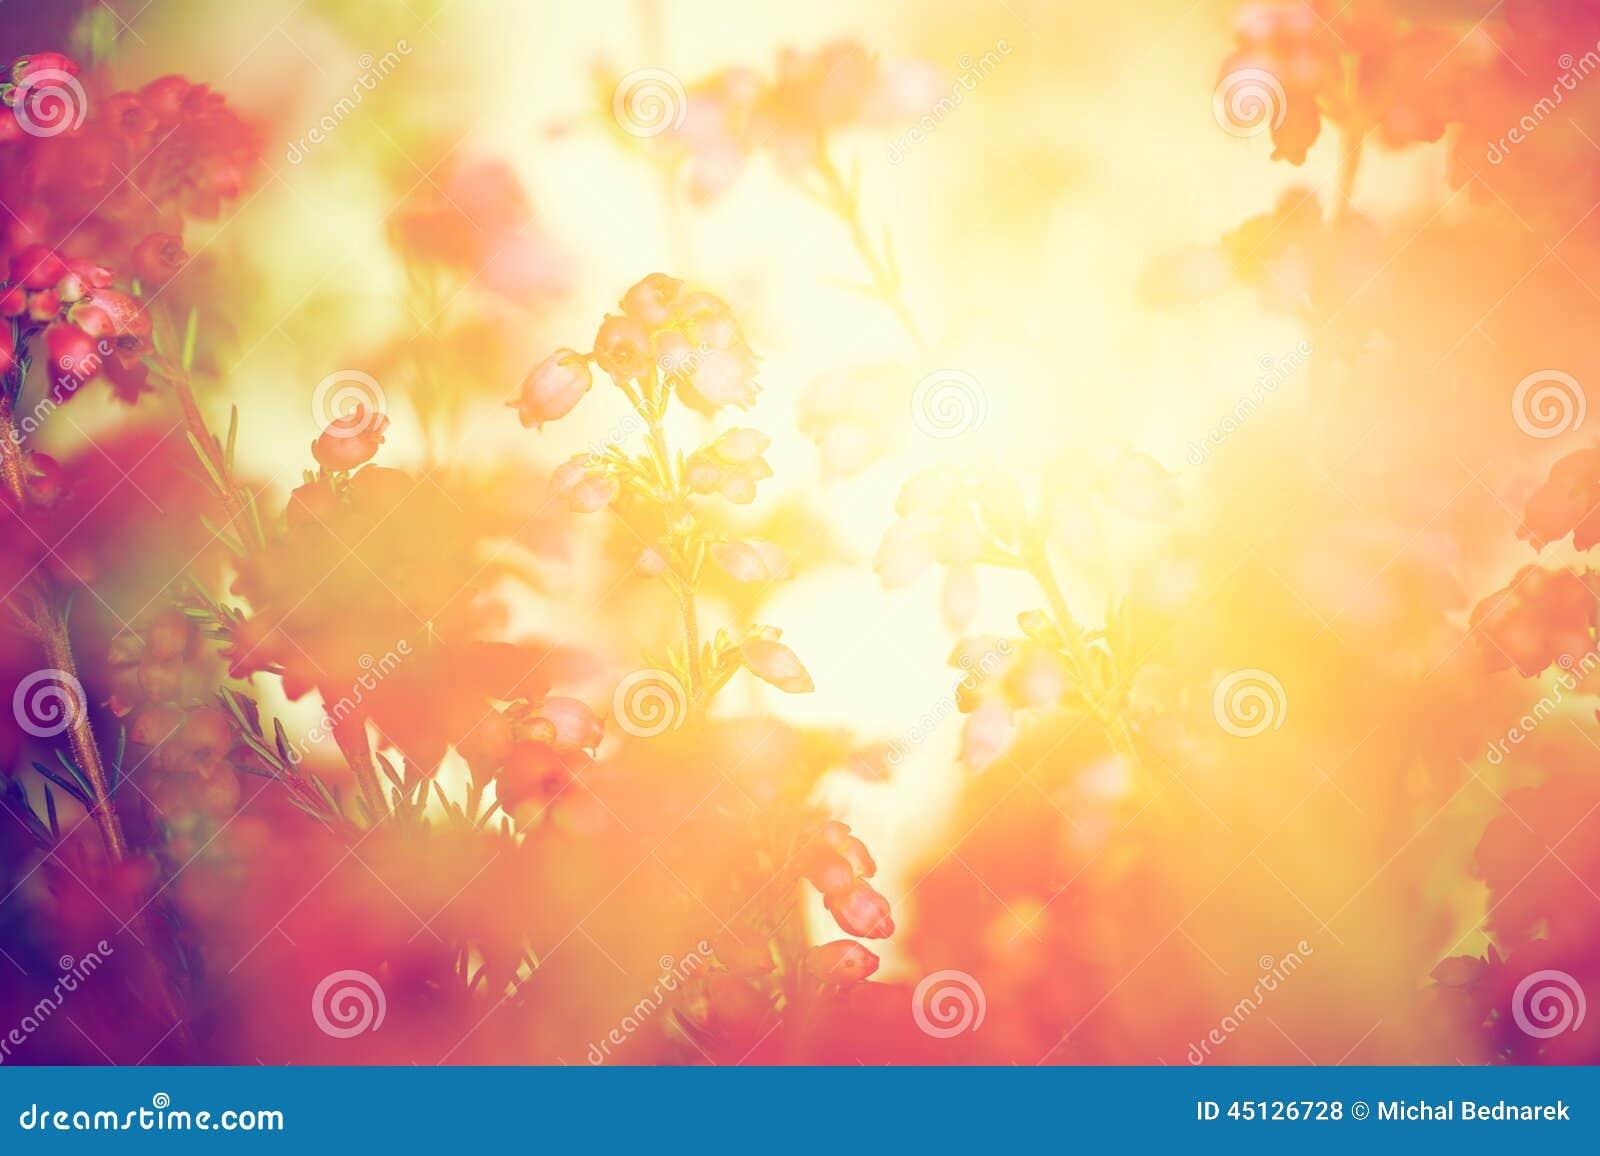 Heather flowers on a fall, autumn meadow in shining sun